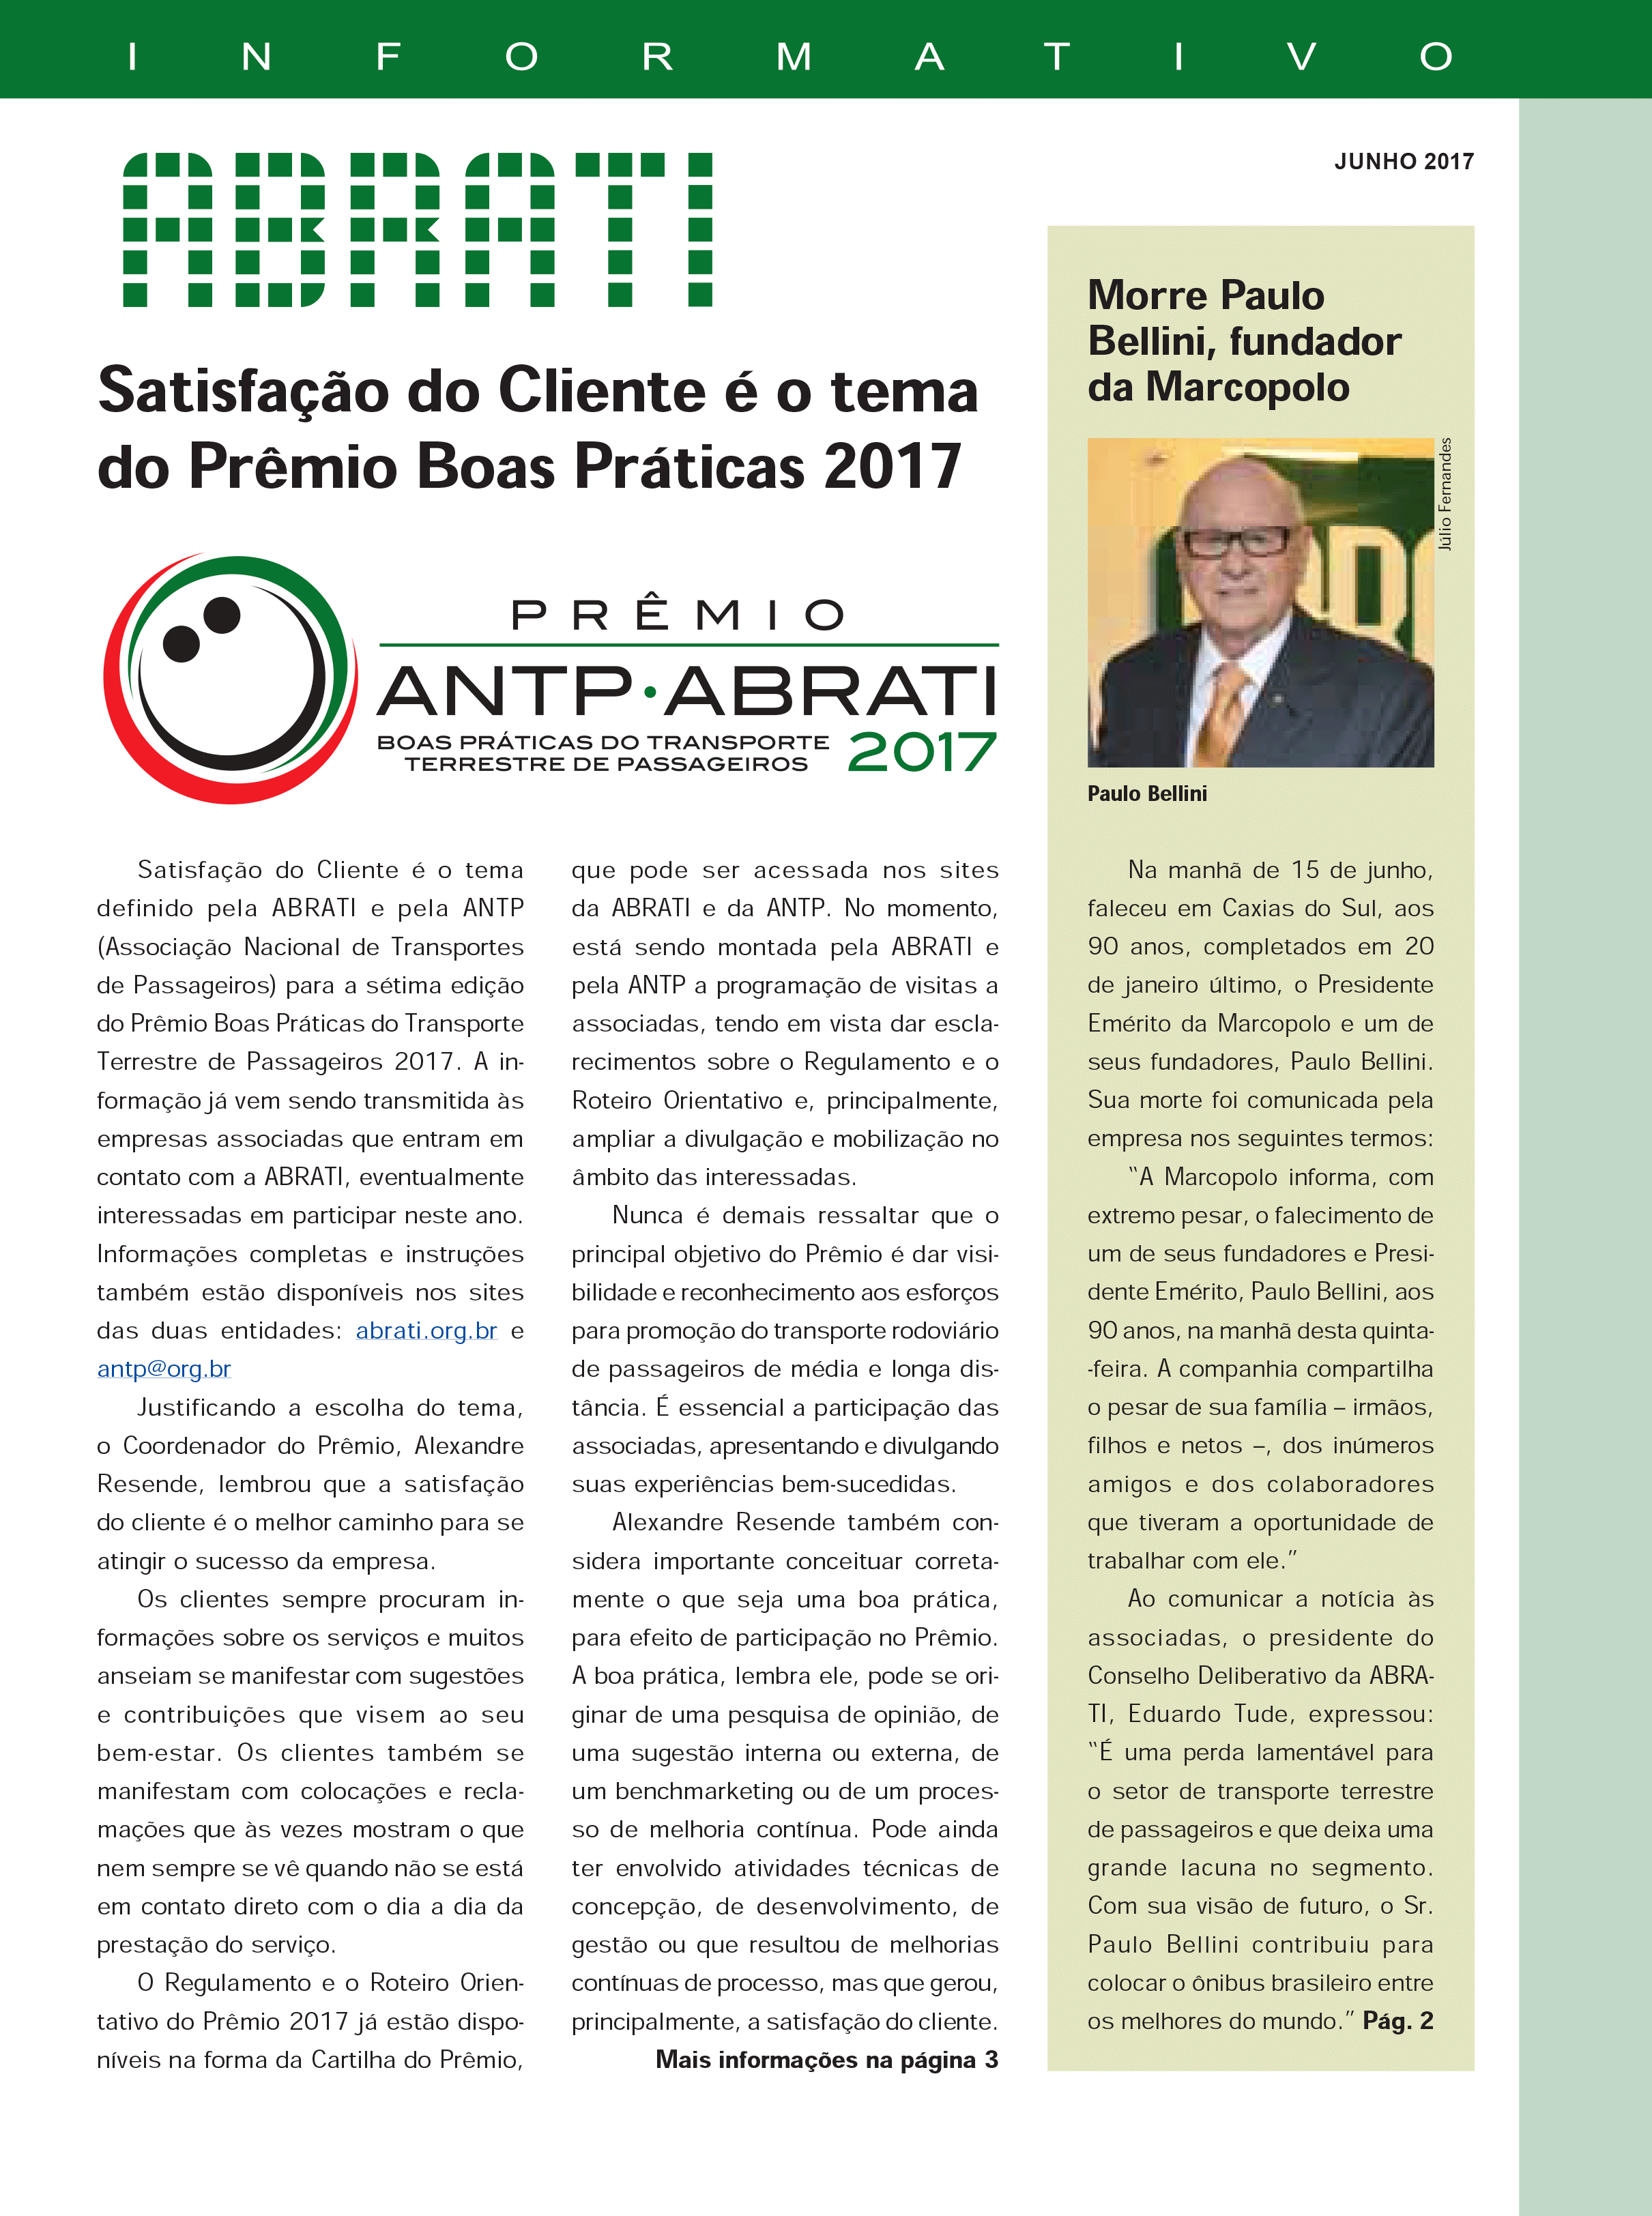 Informativo Junho 2017